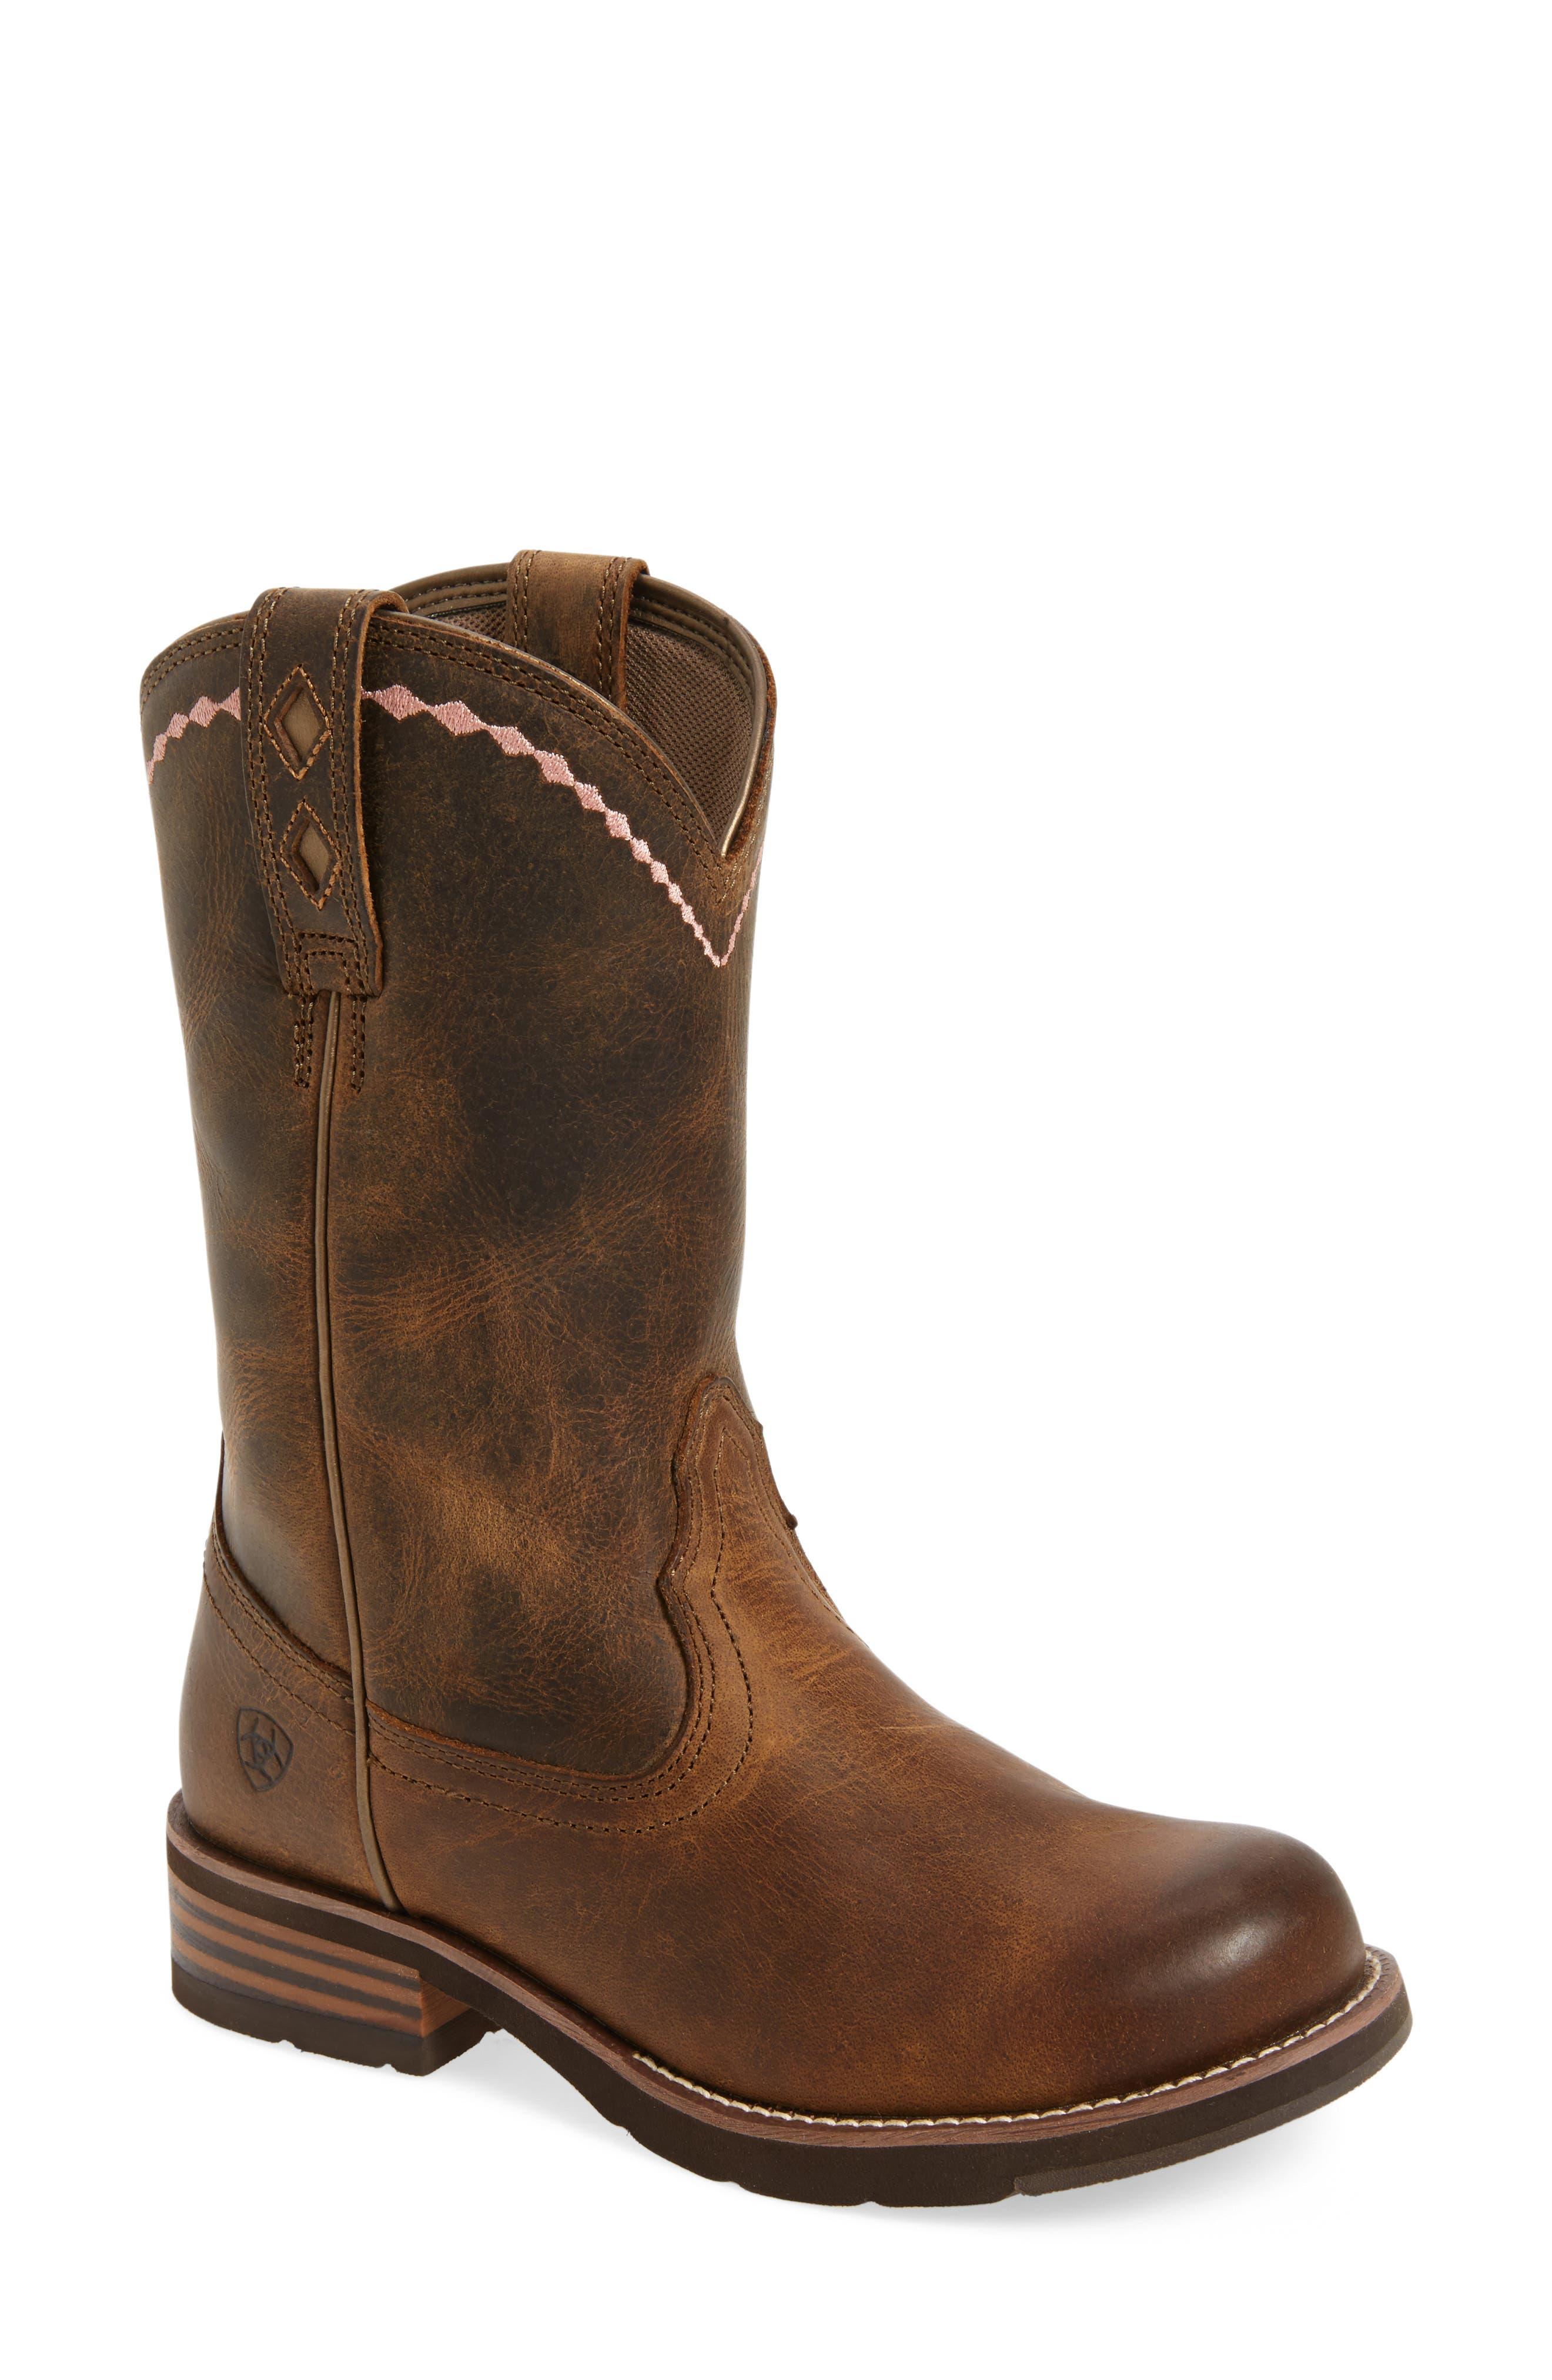 Alternate Image 1 Selected - Ariat Unbridled Roper Western Boot (Women)